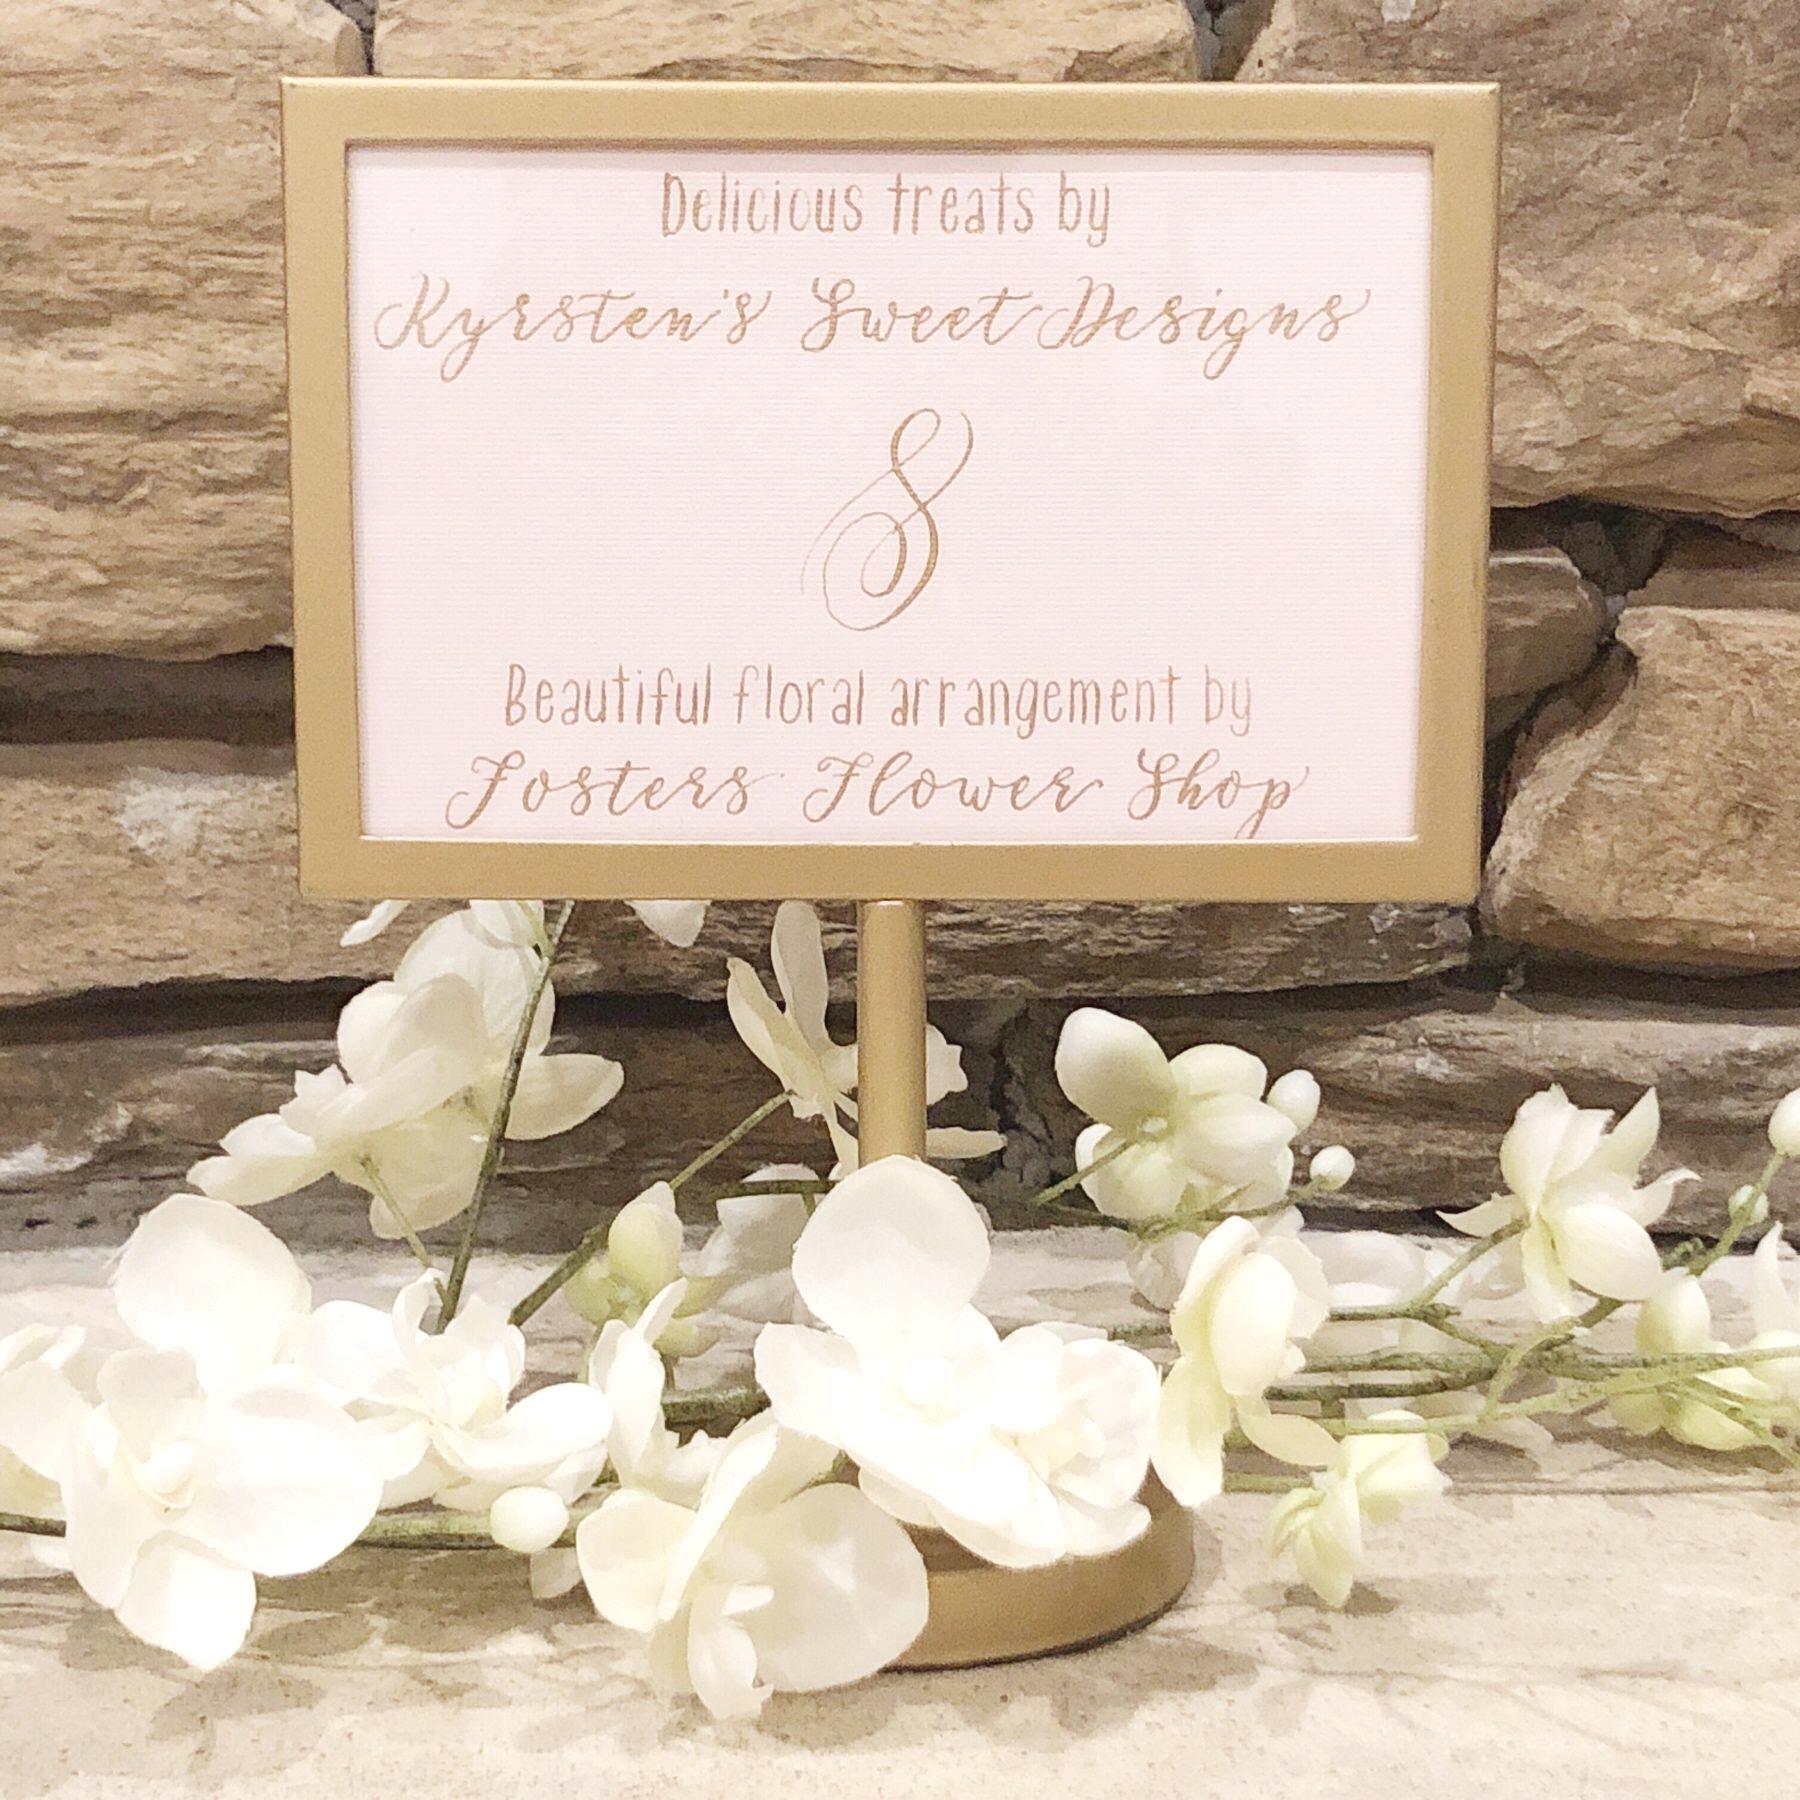 Central PA, York PA, JesSmith Designs, custom, wedding, invitations, bridal, announcements, save the date, baby, hanover, calligraphy, baltimore, wedding invitations, lancaster, gettysburg-03-08 08.42.24.jpg